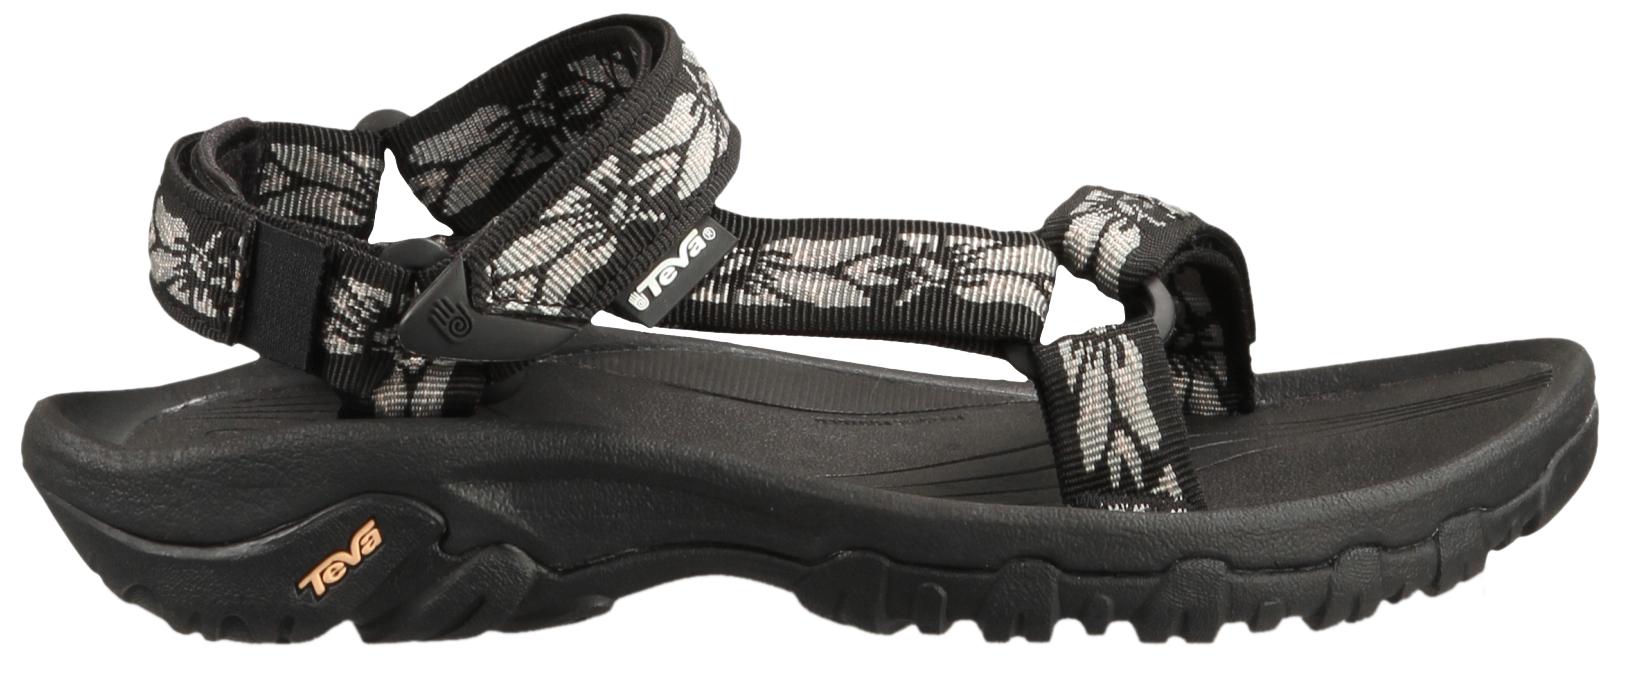 Teva Women's Xlt Hurricane Xlt Sandals Hurricane Sandals Teva e2EH9IWDY